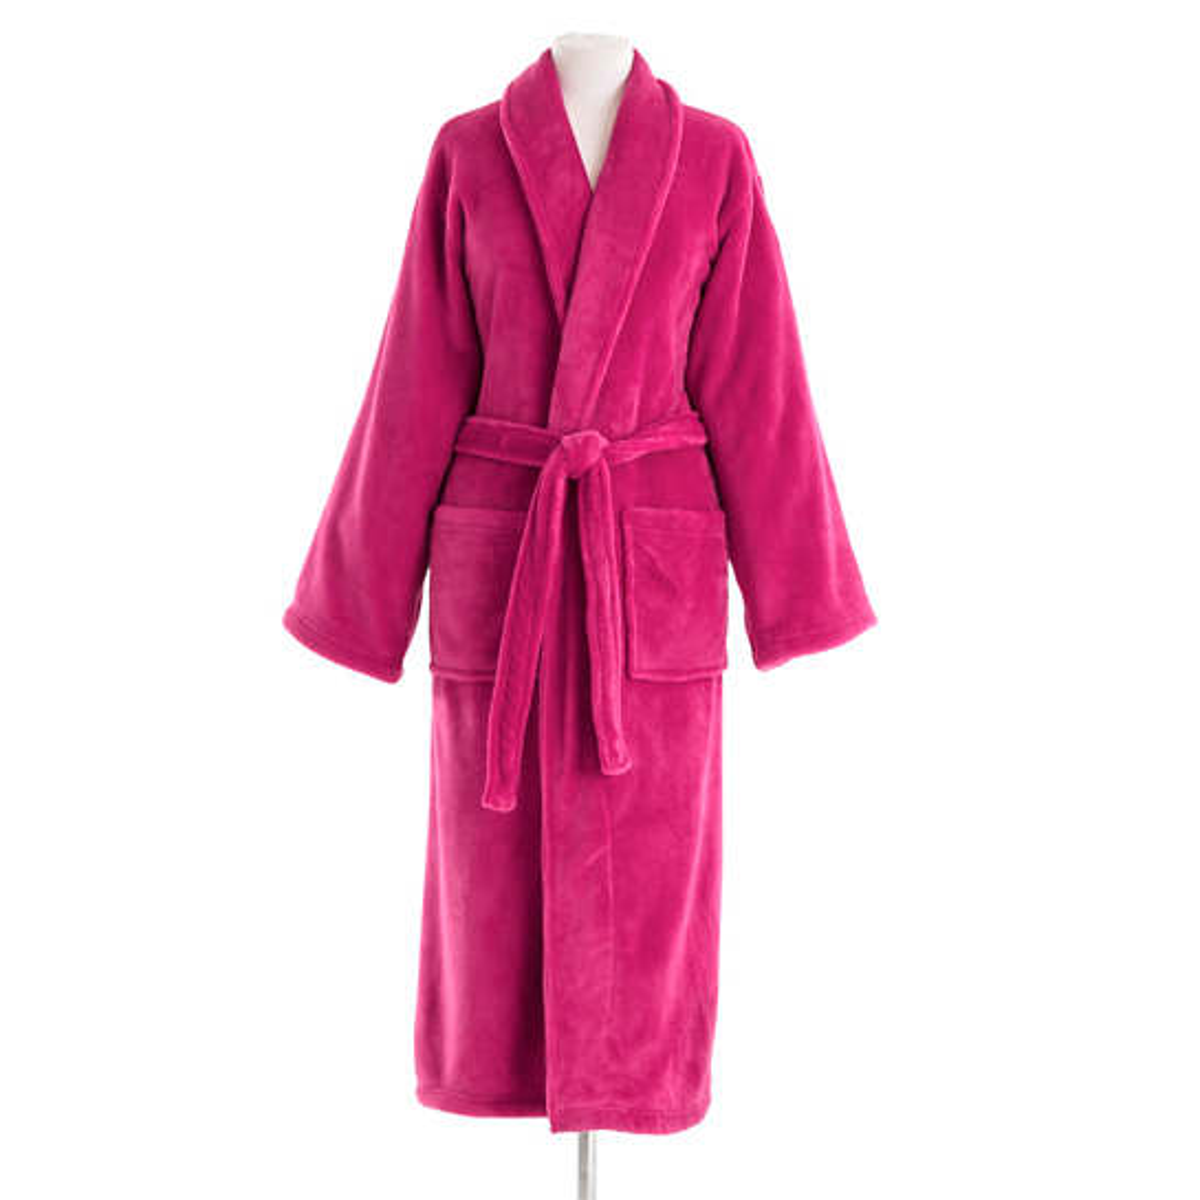 Sheepy Fleece Magenta Robe